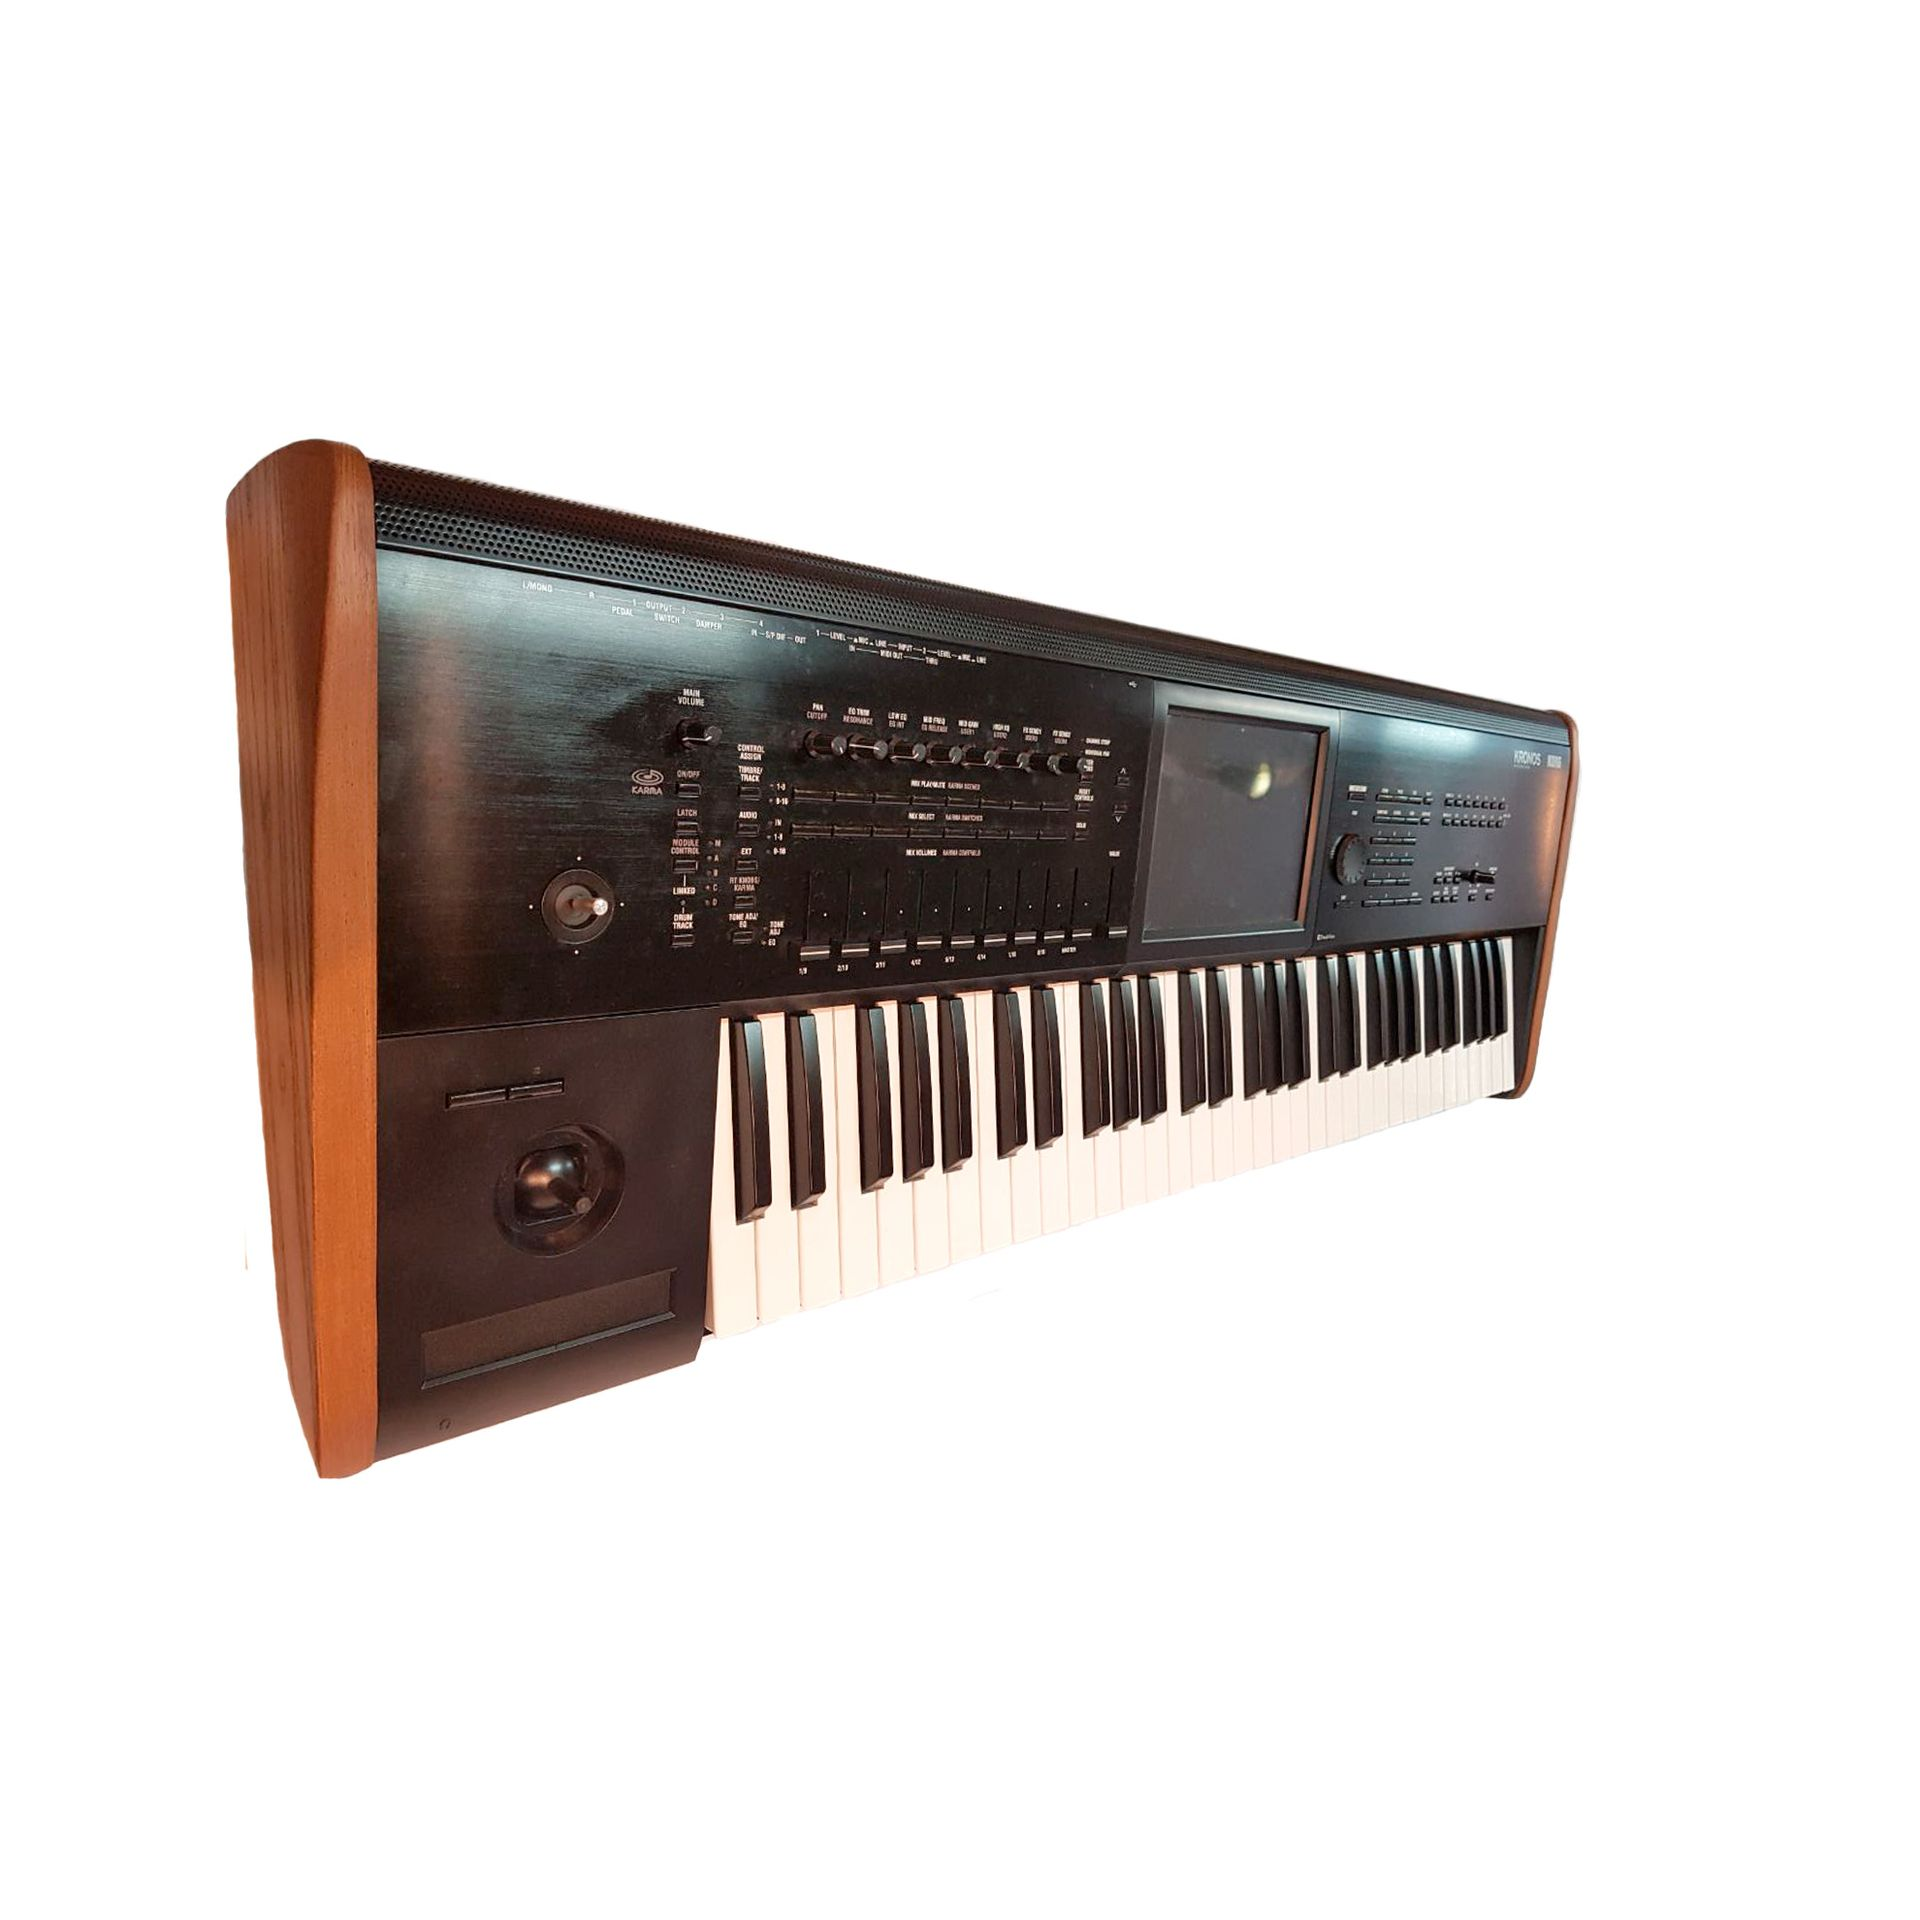 TECLADO KORG KRONOS 2 61 (USADO) - X5Music